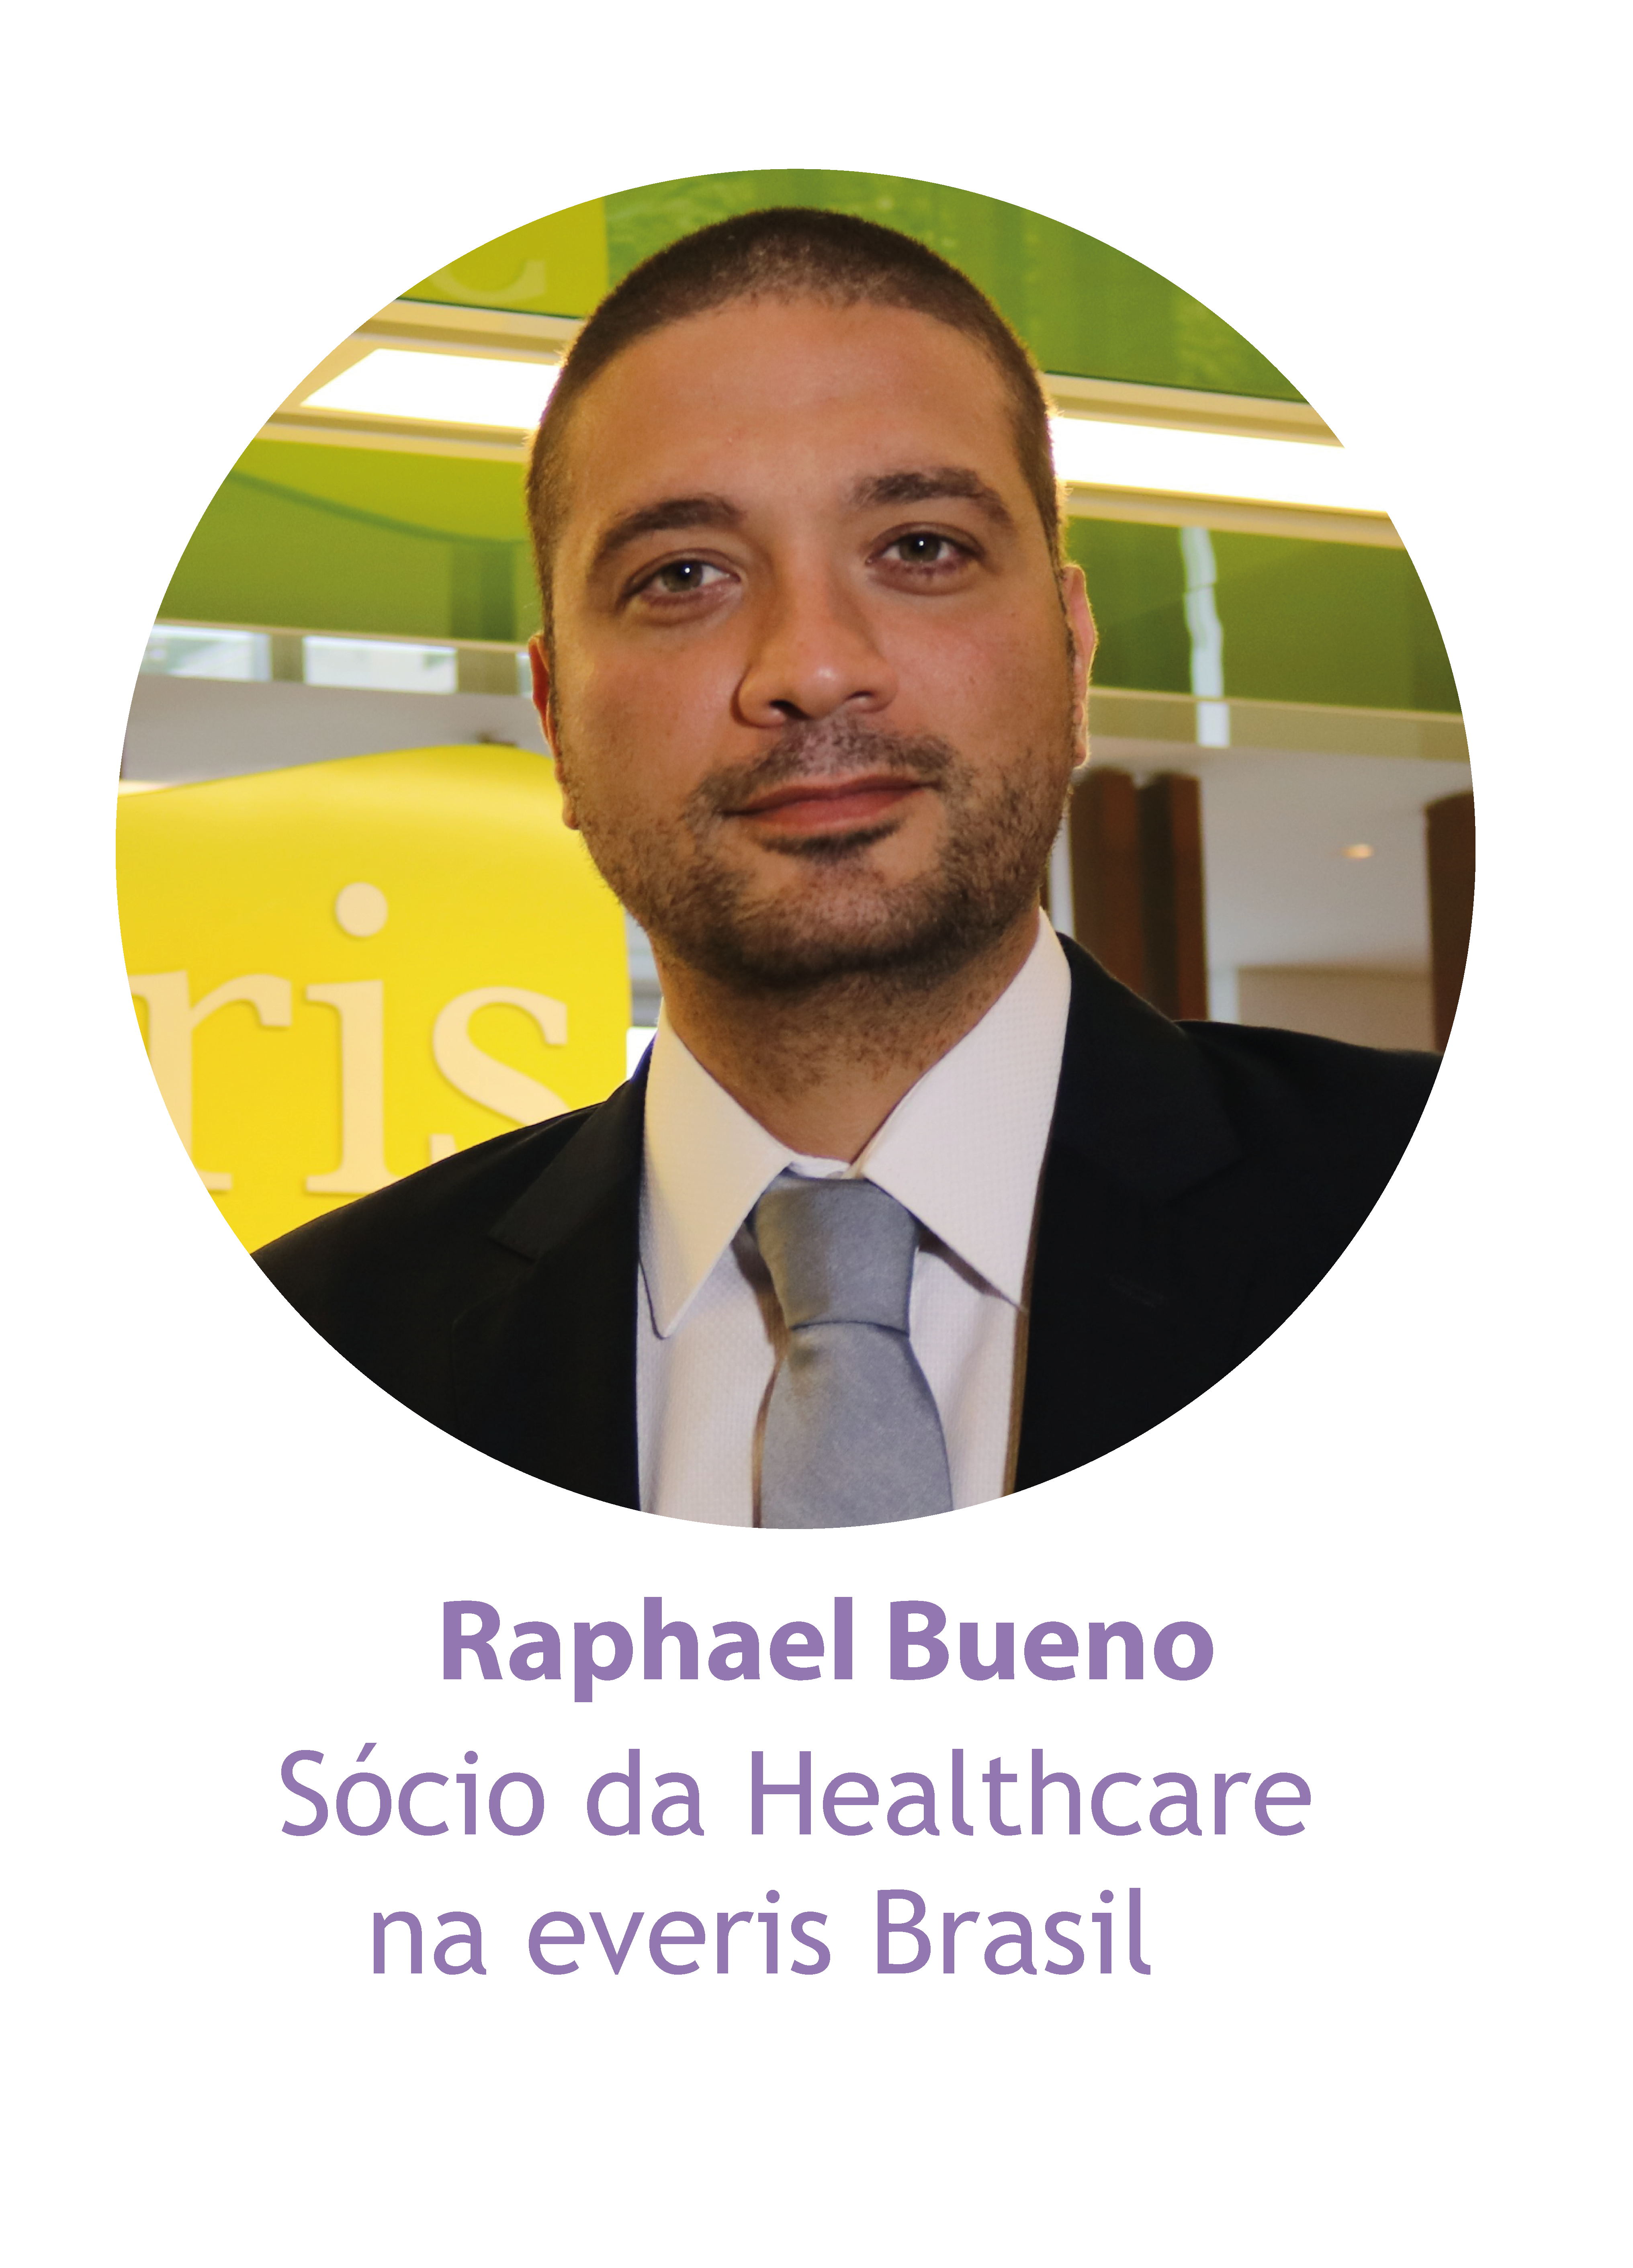 Raphael Bueno